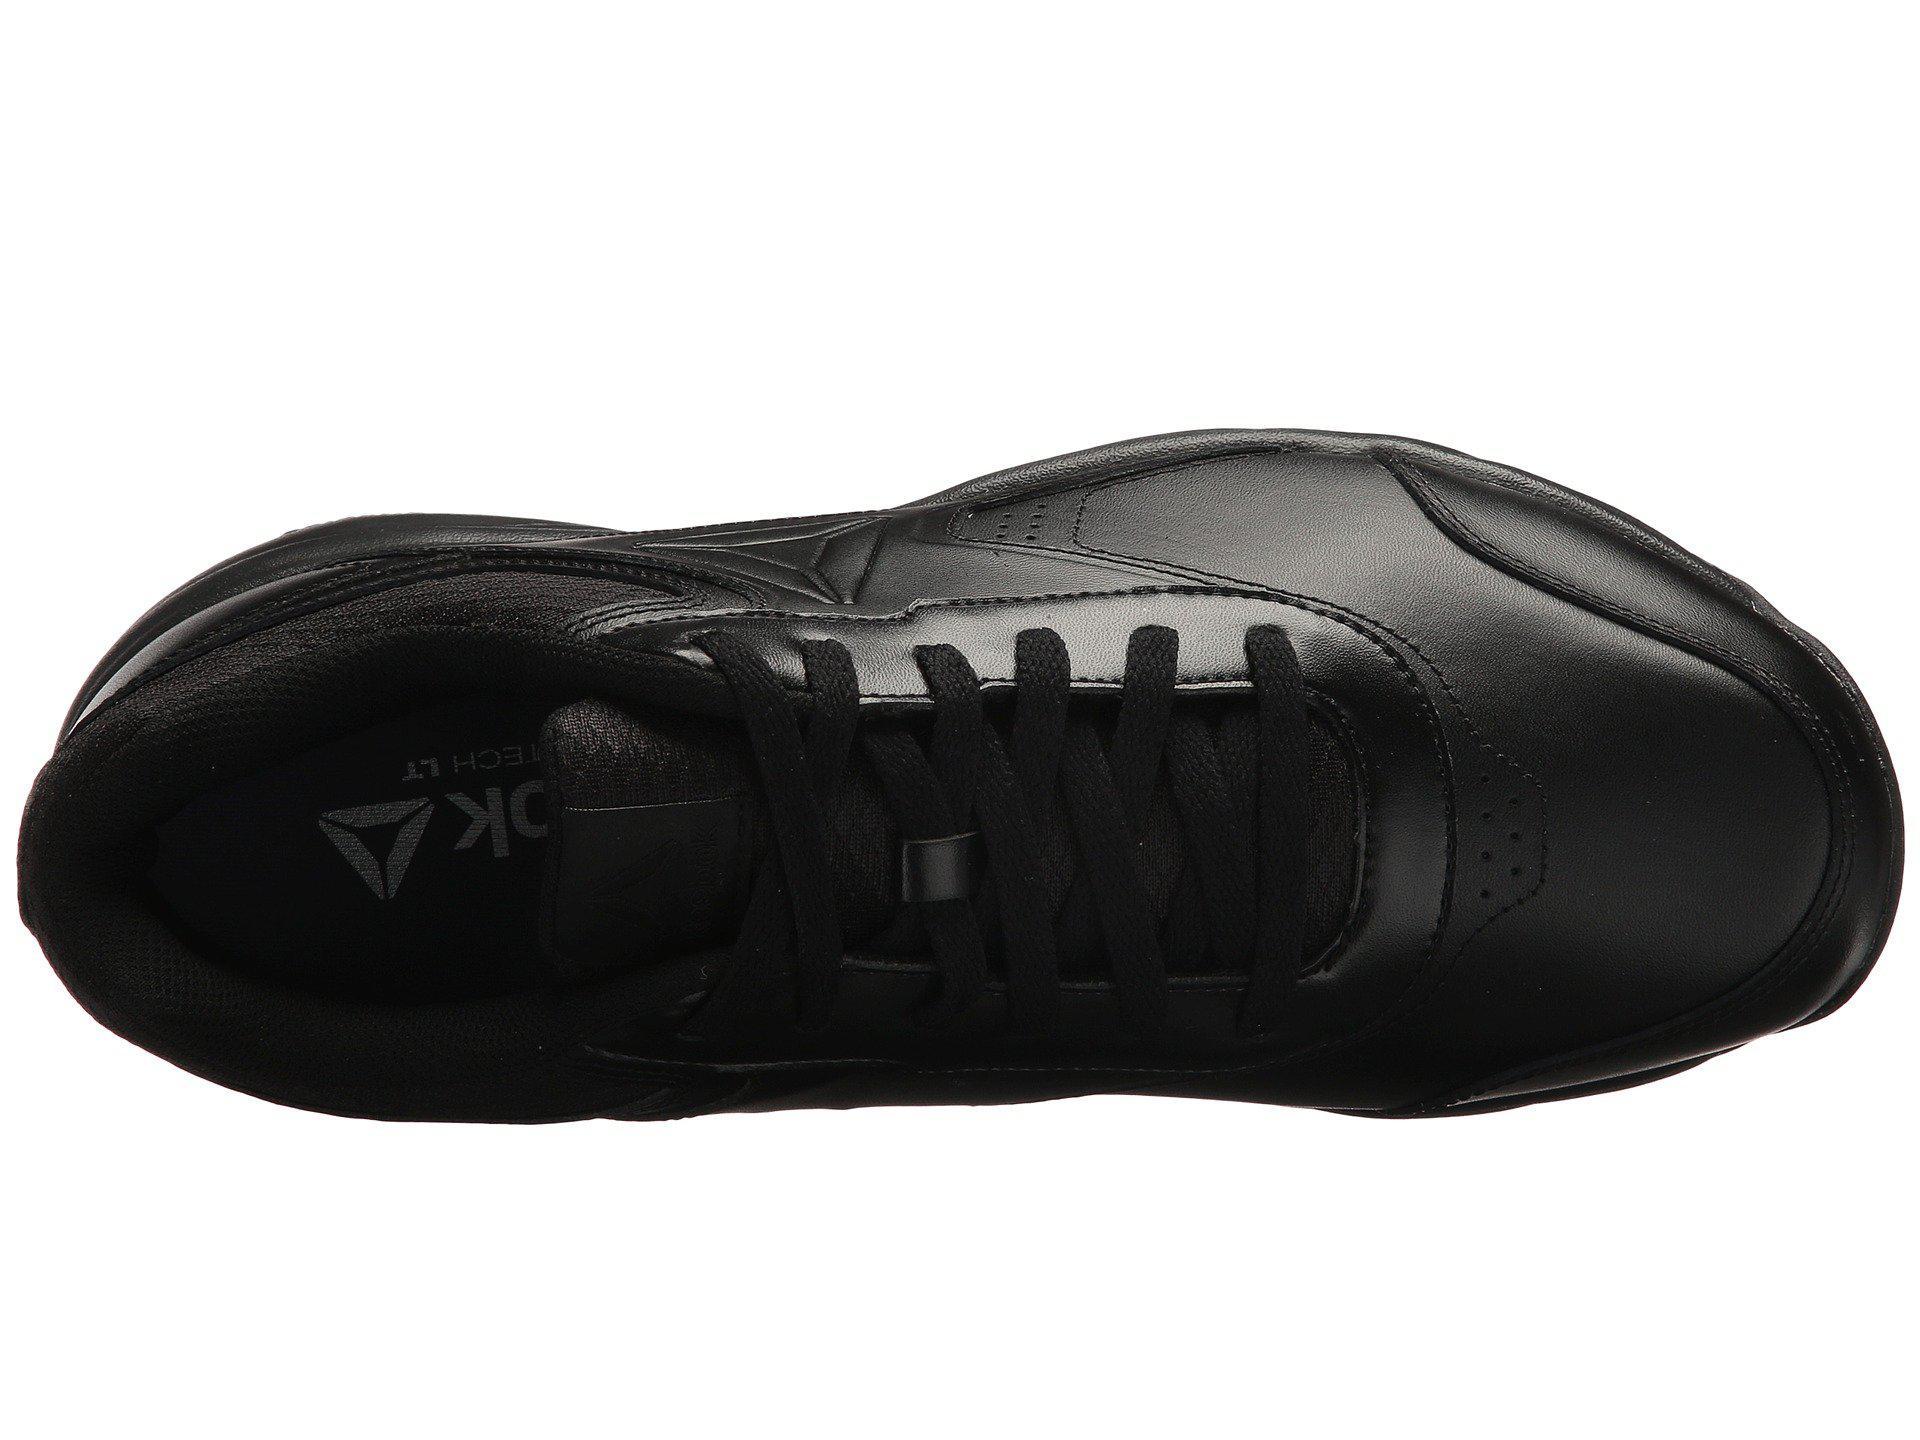 59e2a9b096c884 Reebok - Black Work N Cushion 3.0 for Men - Lyst. View fullscreen